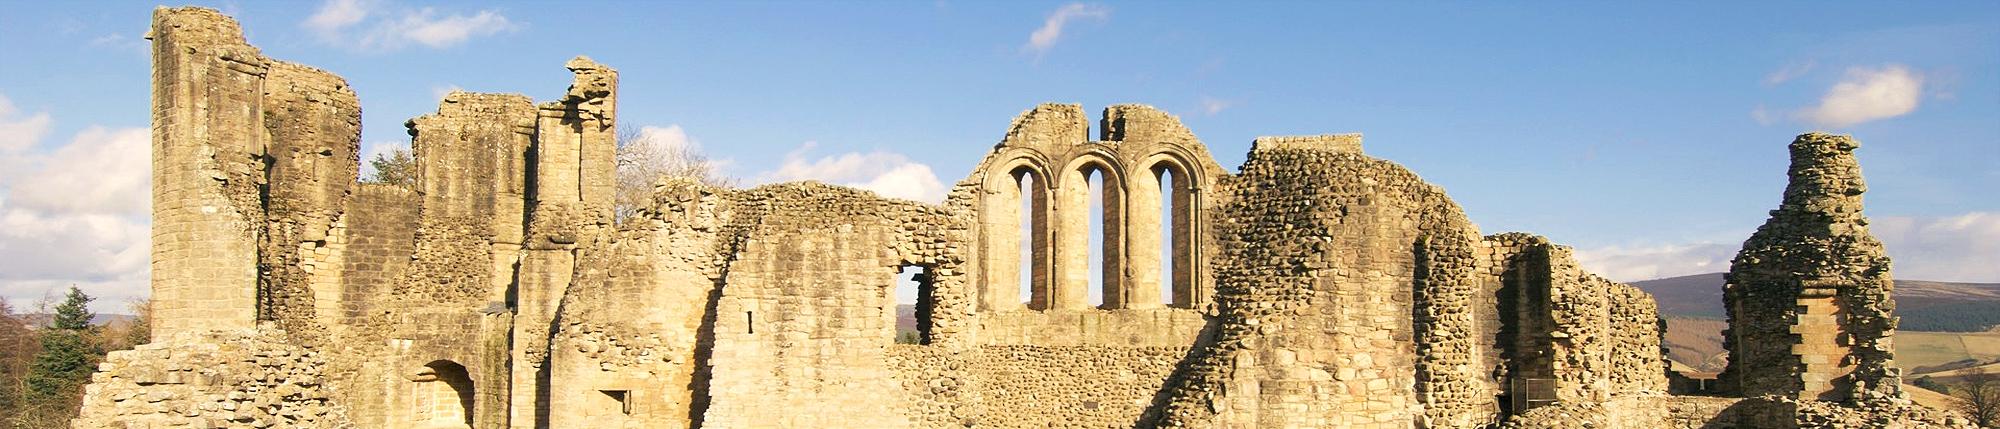 lynebain-castles-secc